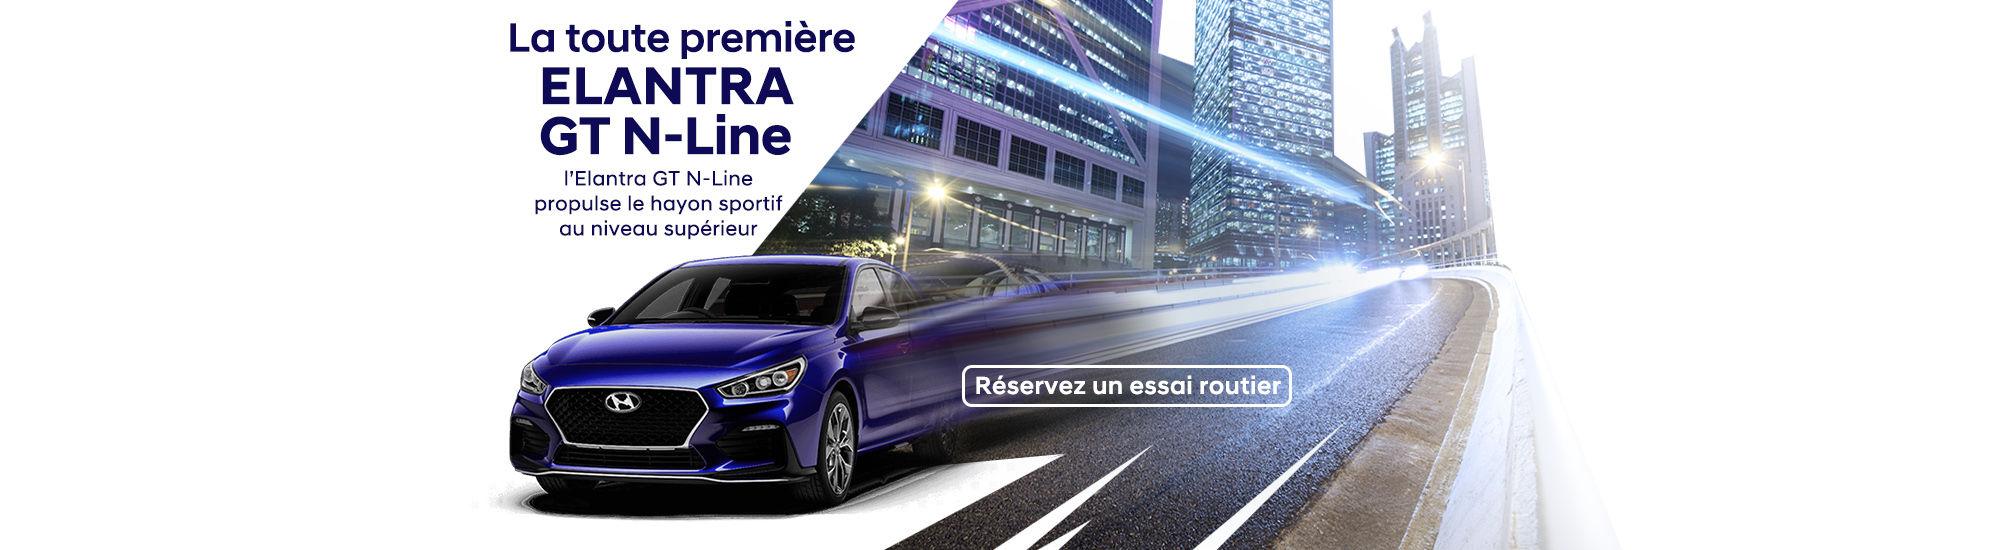 Elantra GT-N-Line 2019